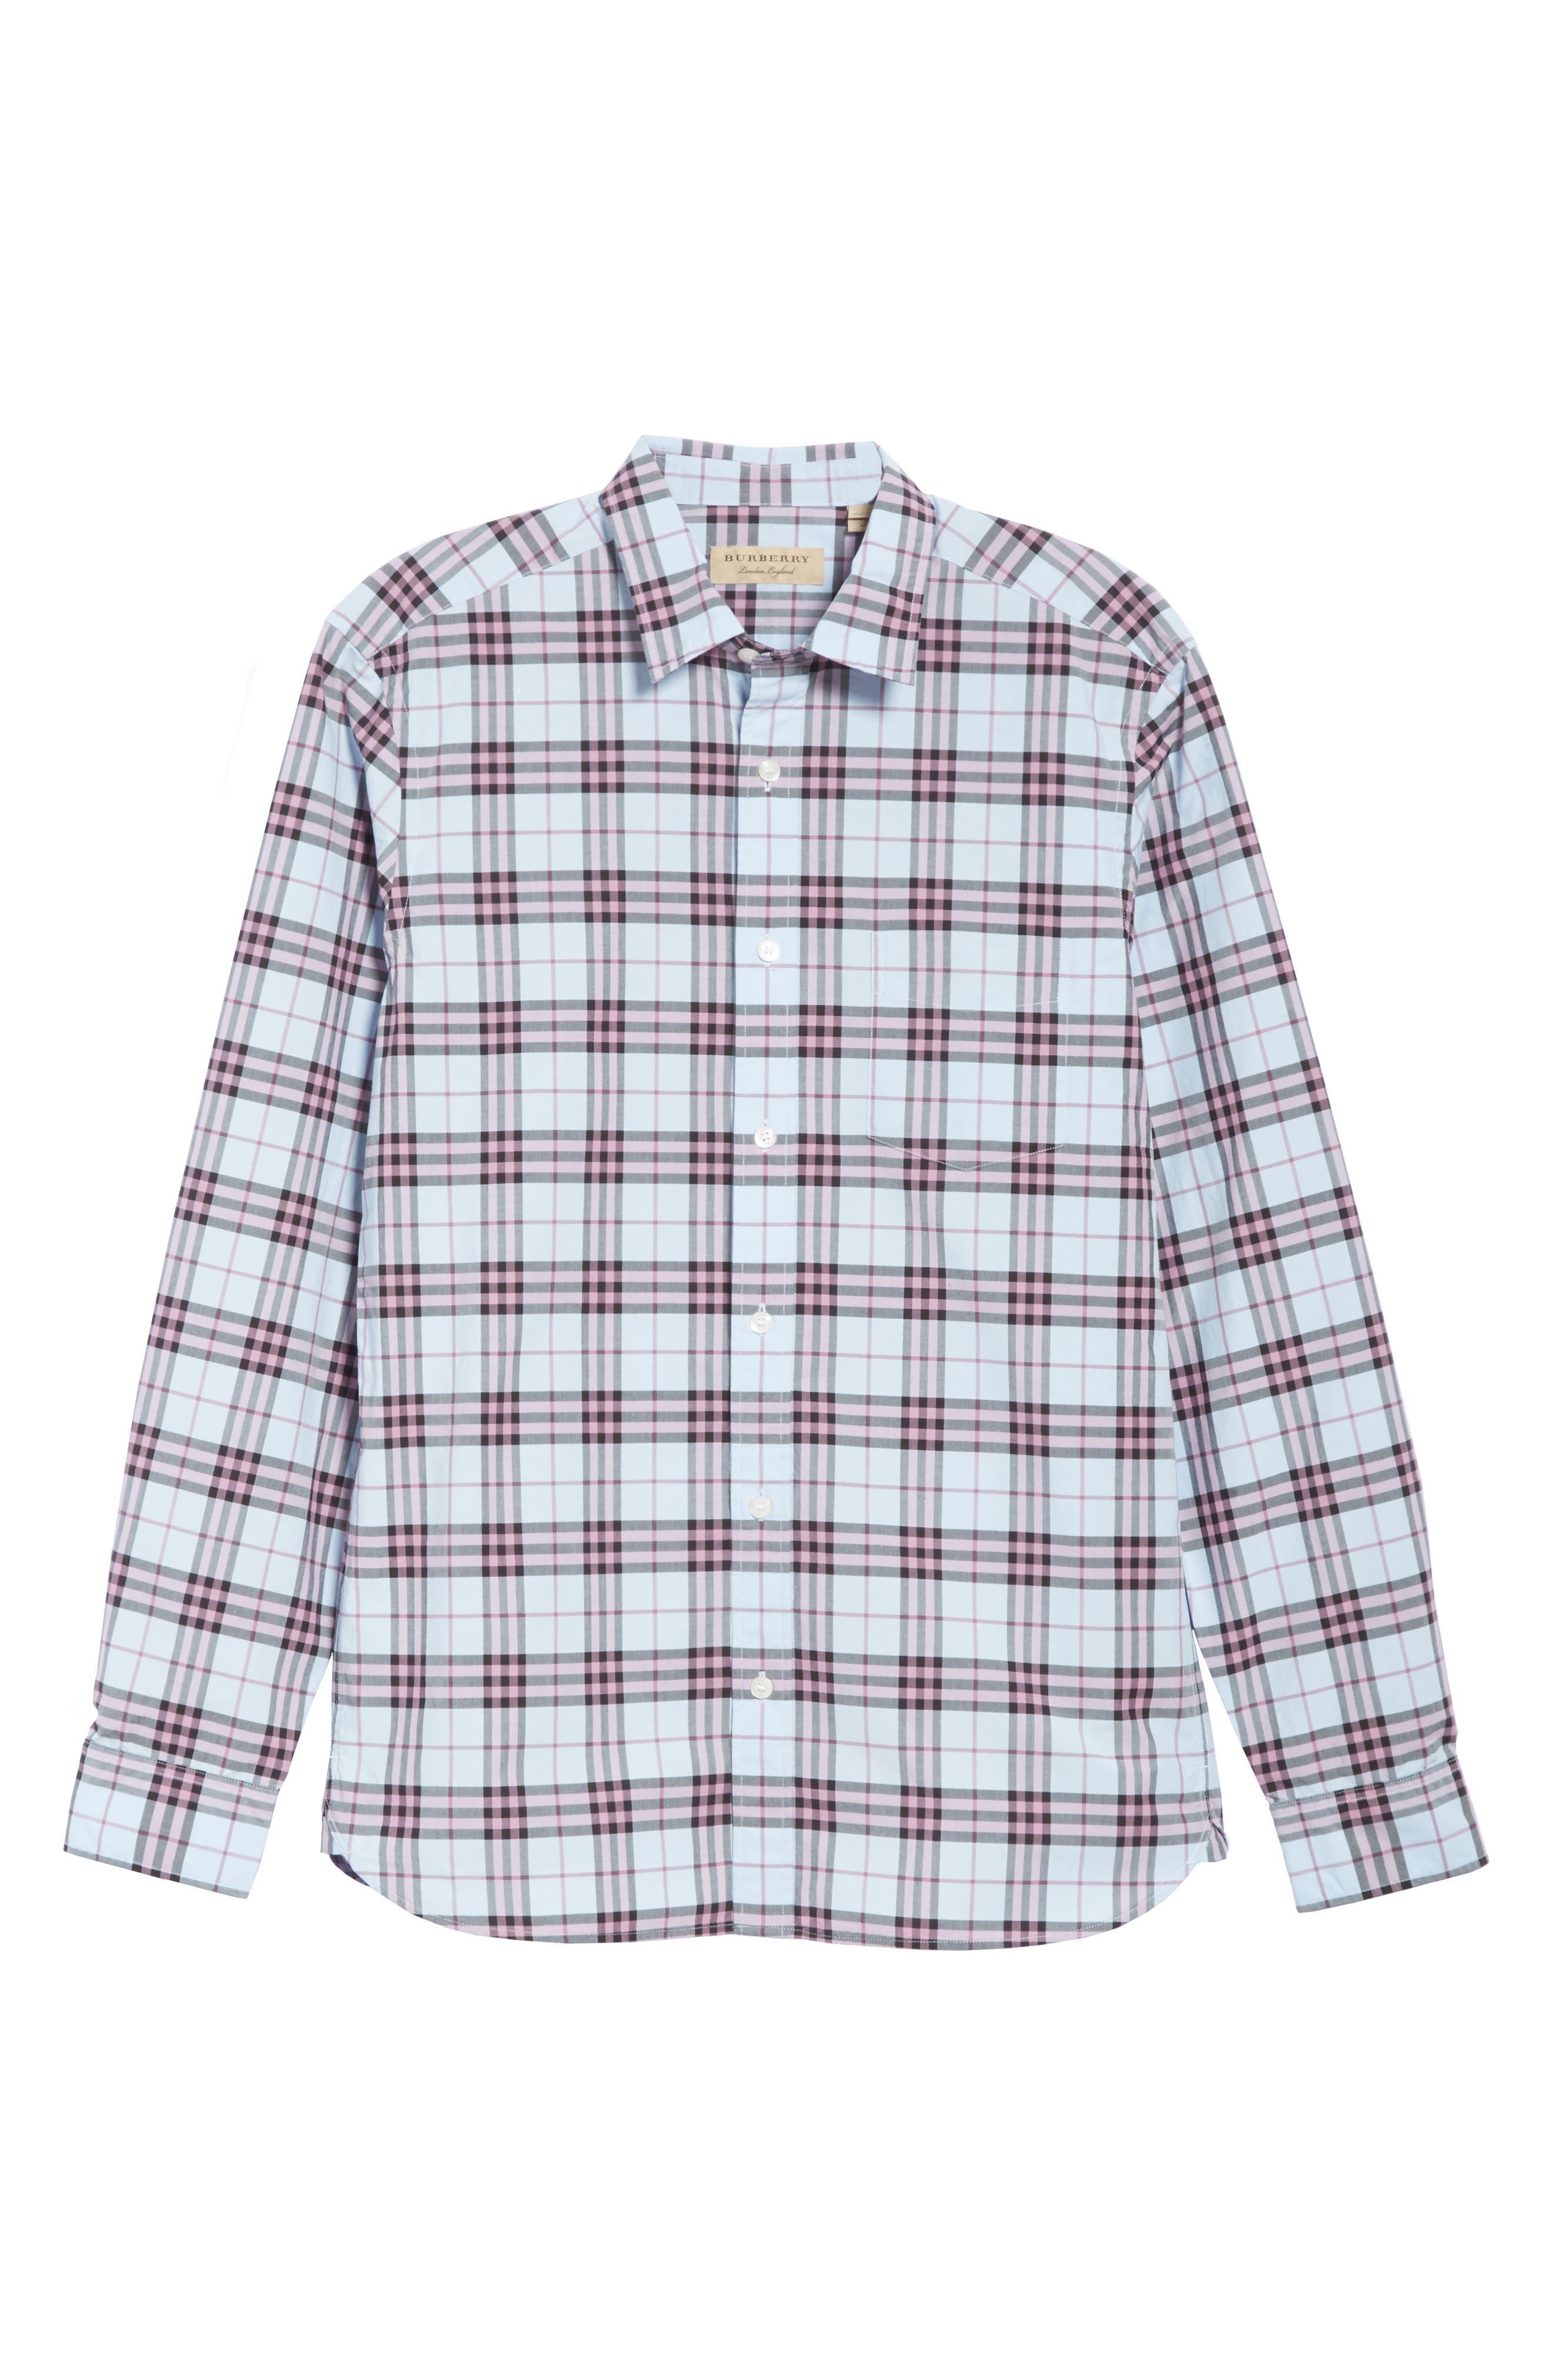 Alexander Standard Fit Check Sport Shirt,                             Alternate thumbnail 6, color,                             Lavender Blue